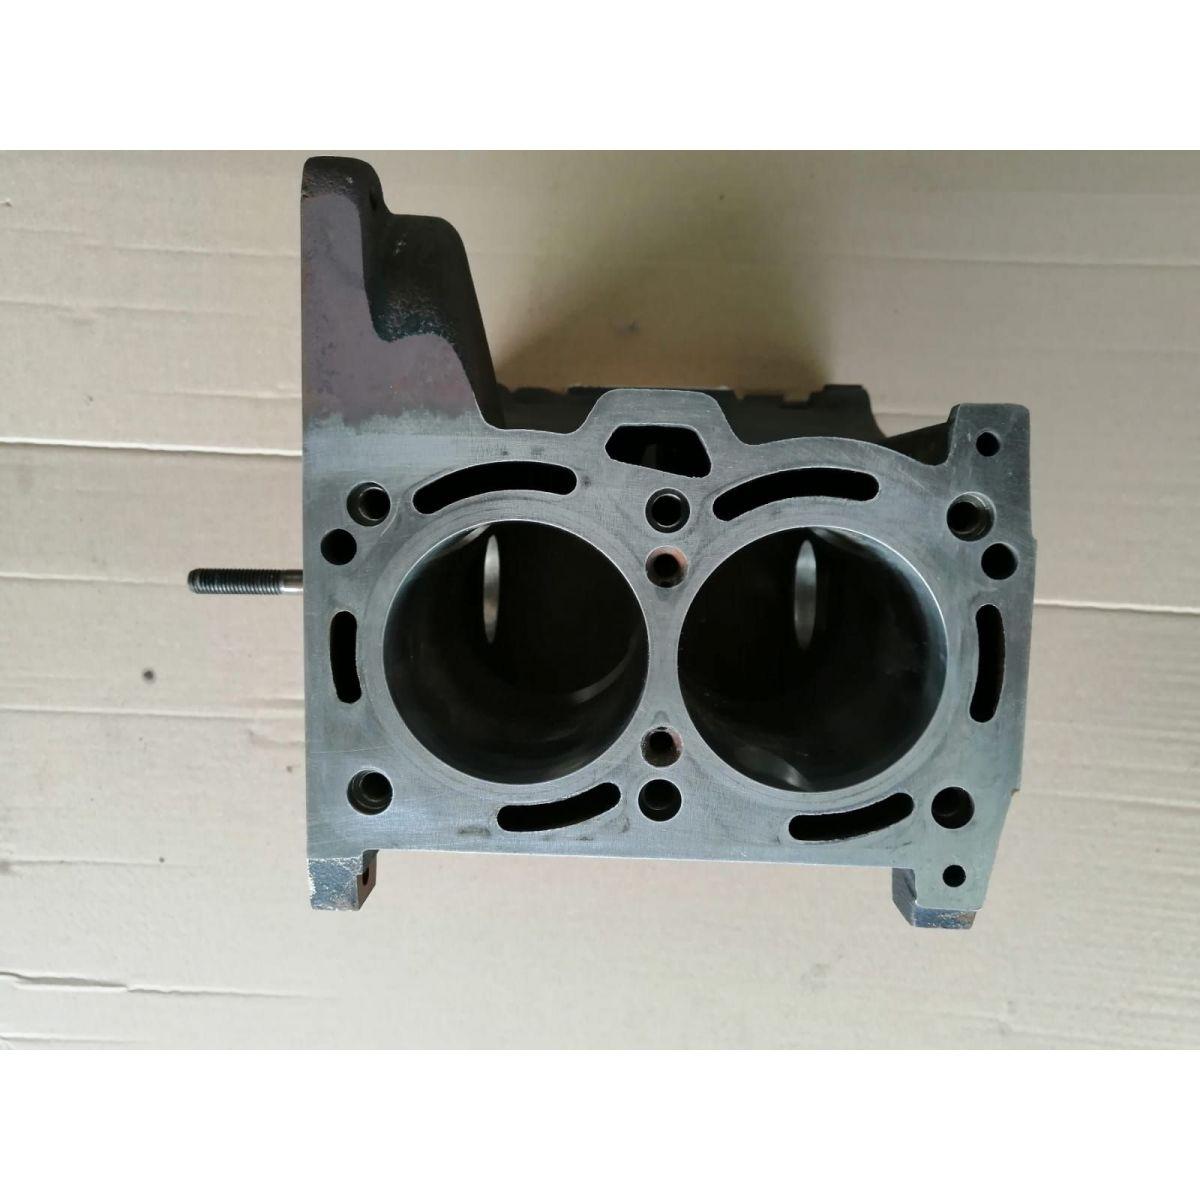 Basamento motore Piaggio quargo ldw-720/p